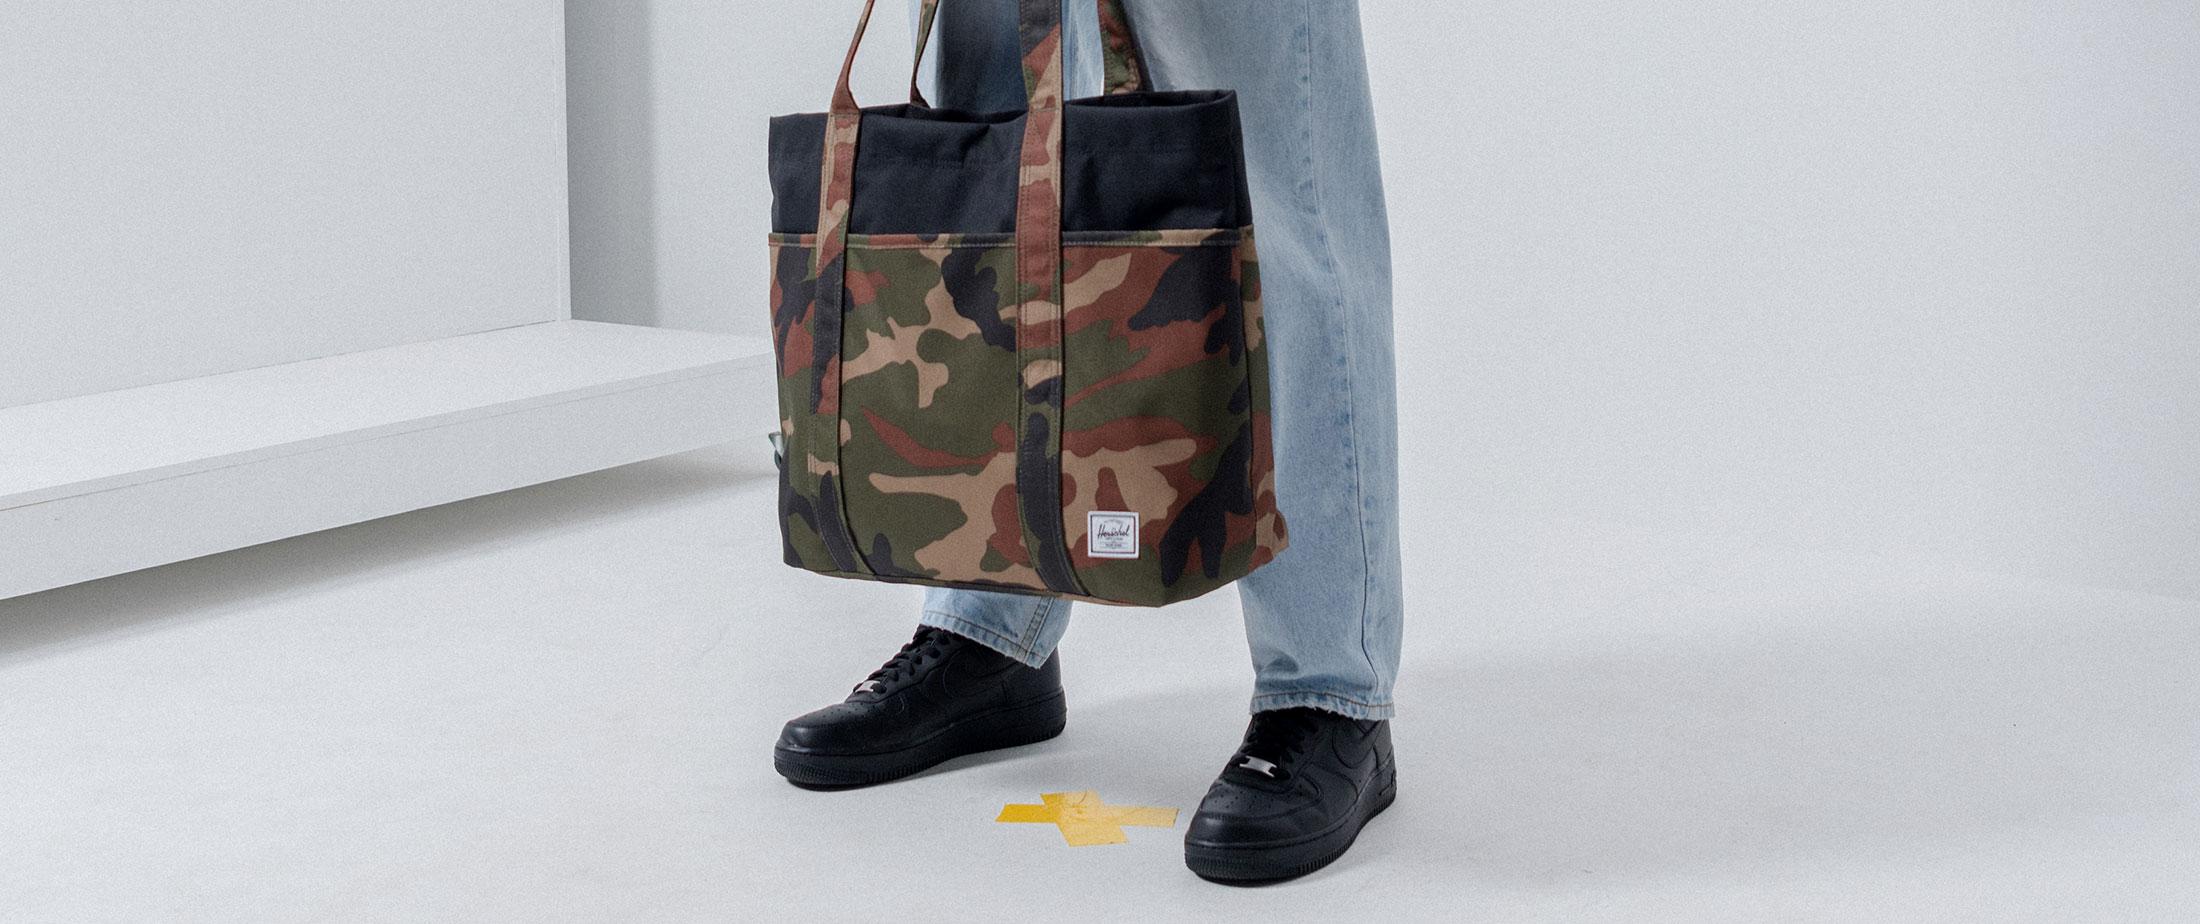 36cfdfd08f Tote Bags